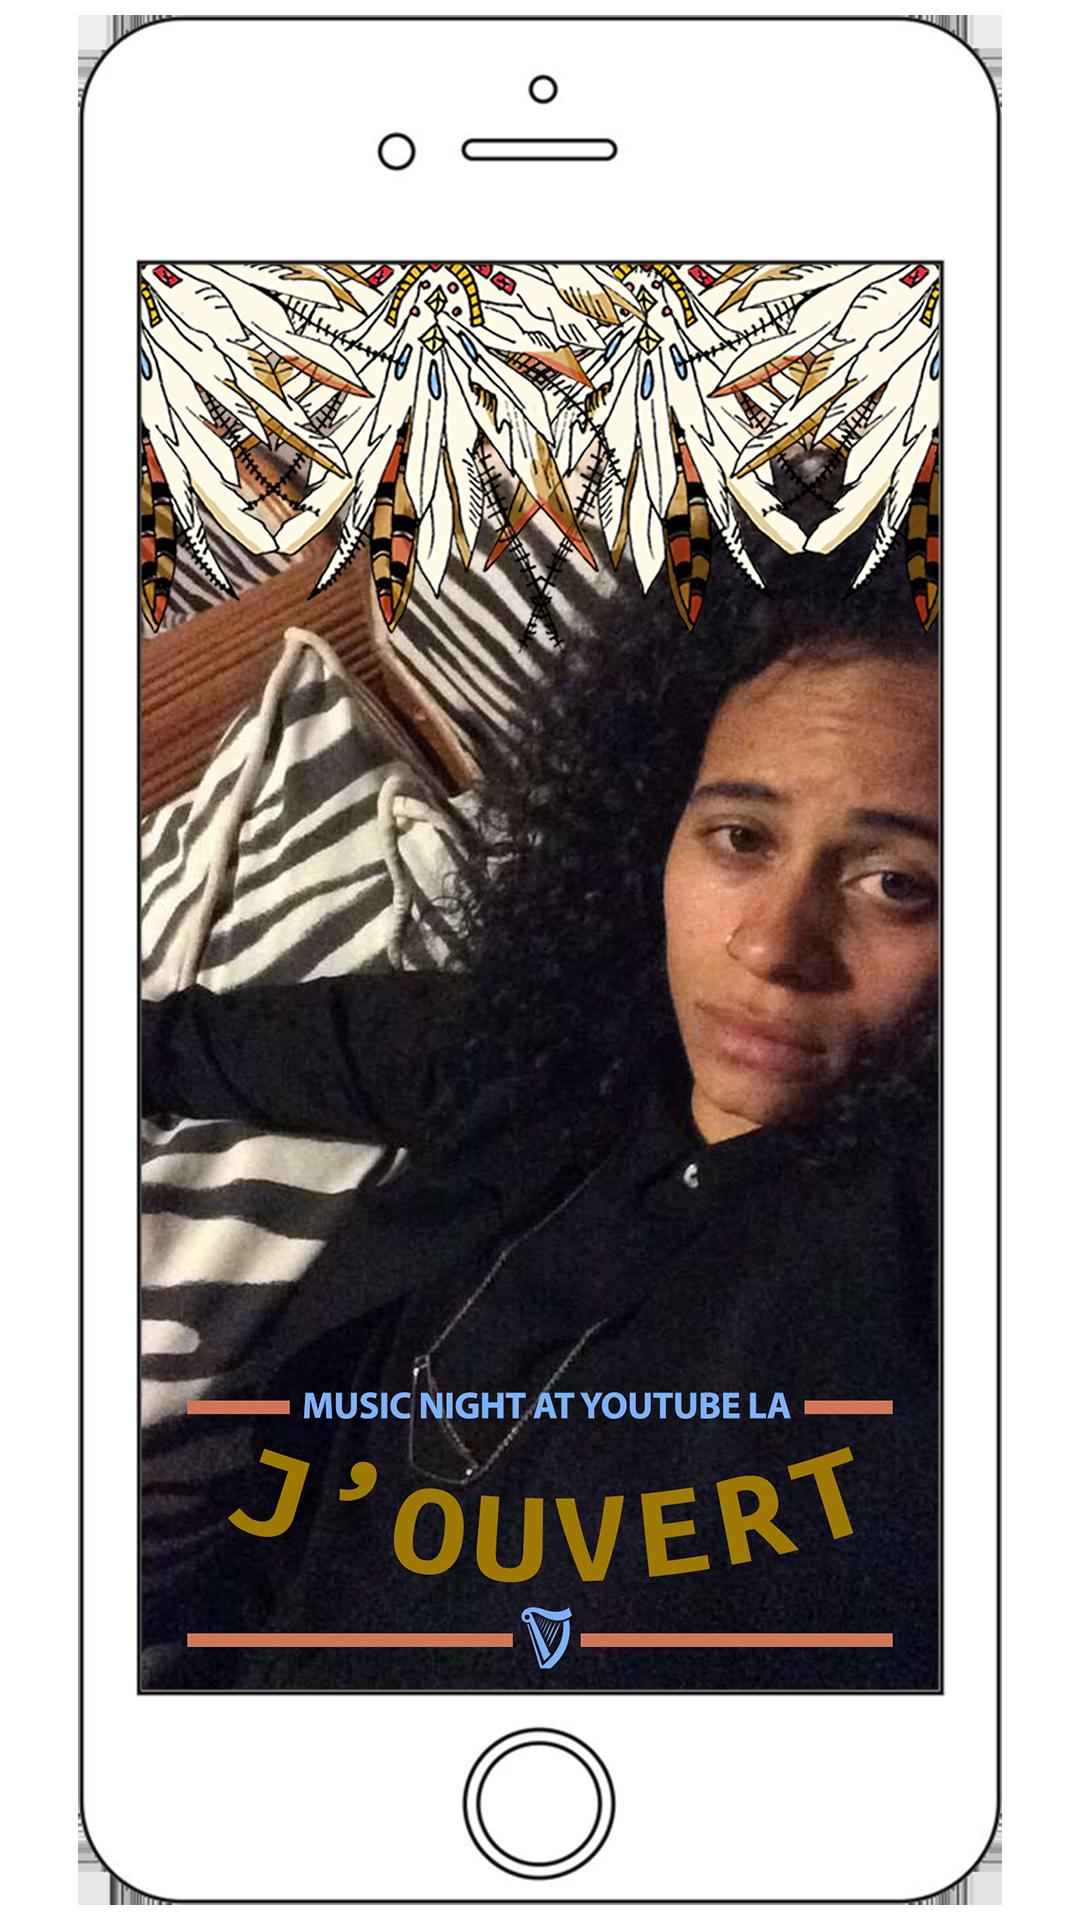 wyclef jean_snapchat custom3.png